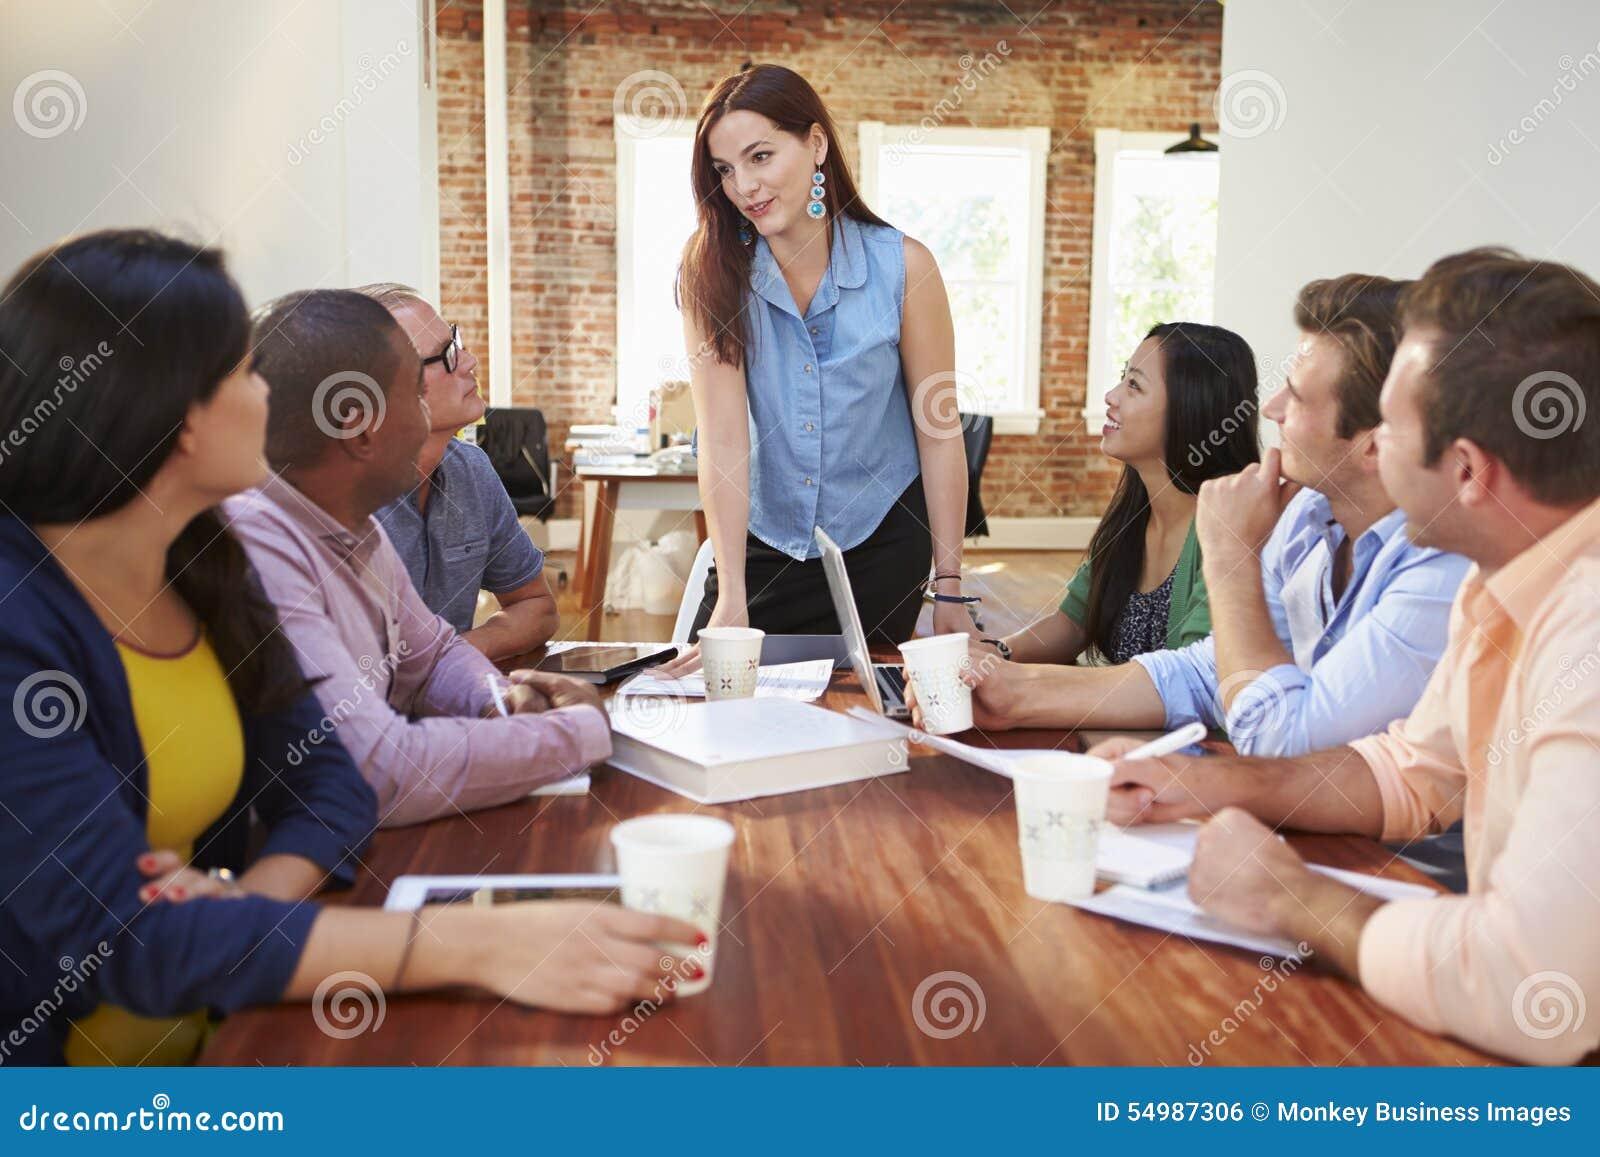 Kvinnligt framstickande Addressing Office Workers på mötet